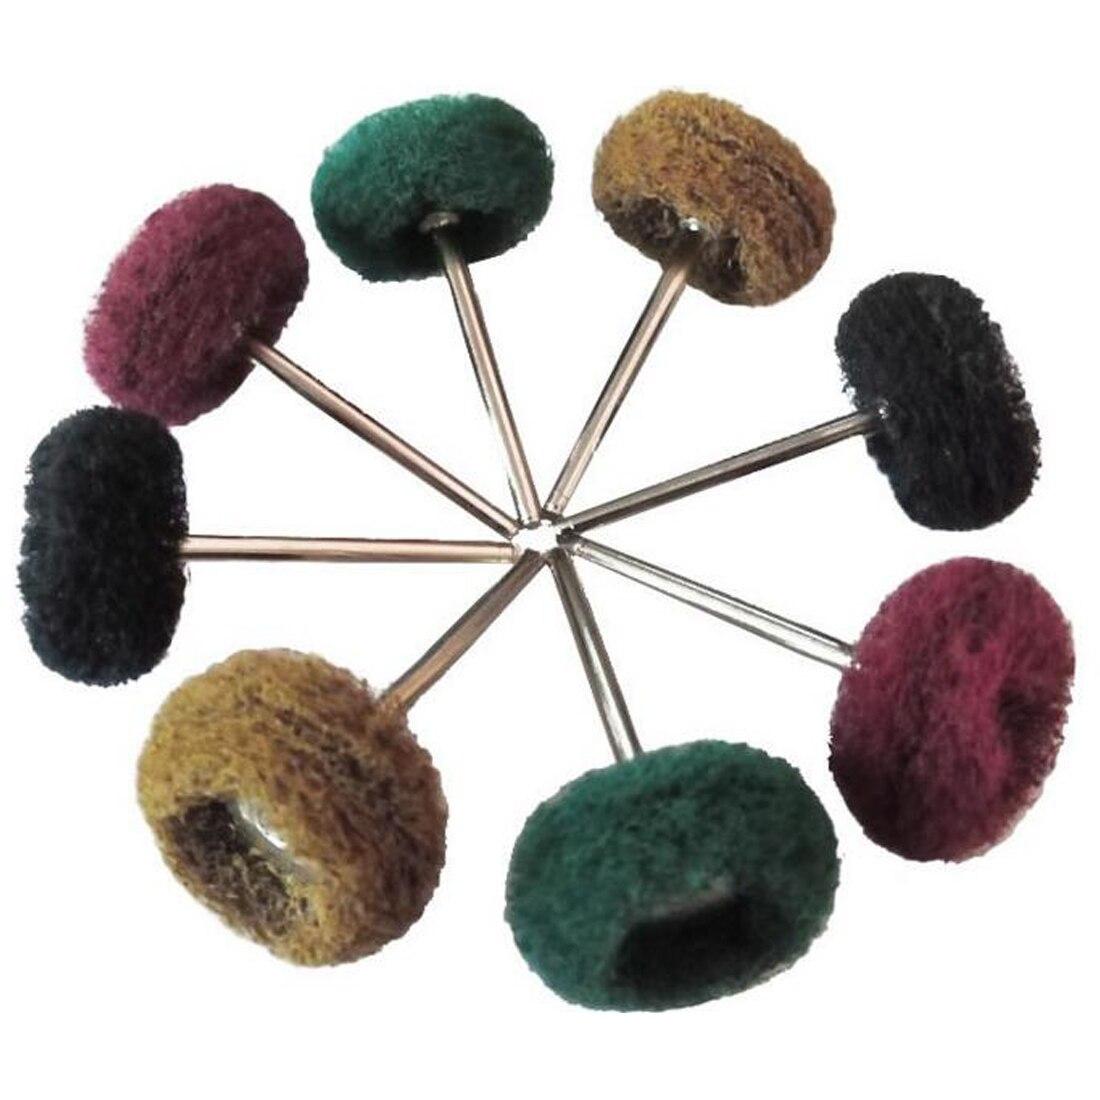 Micro-Electronic Dremel Accessories Polishing Wheel 20pcs Buffing Pad Brush Jewelry Metal For Rotary Tools Nylon Polishing Pads